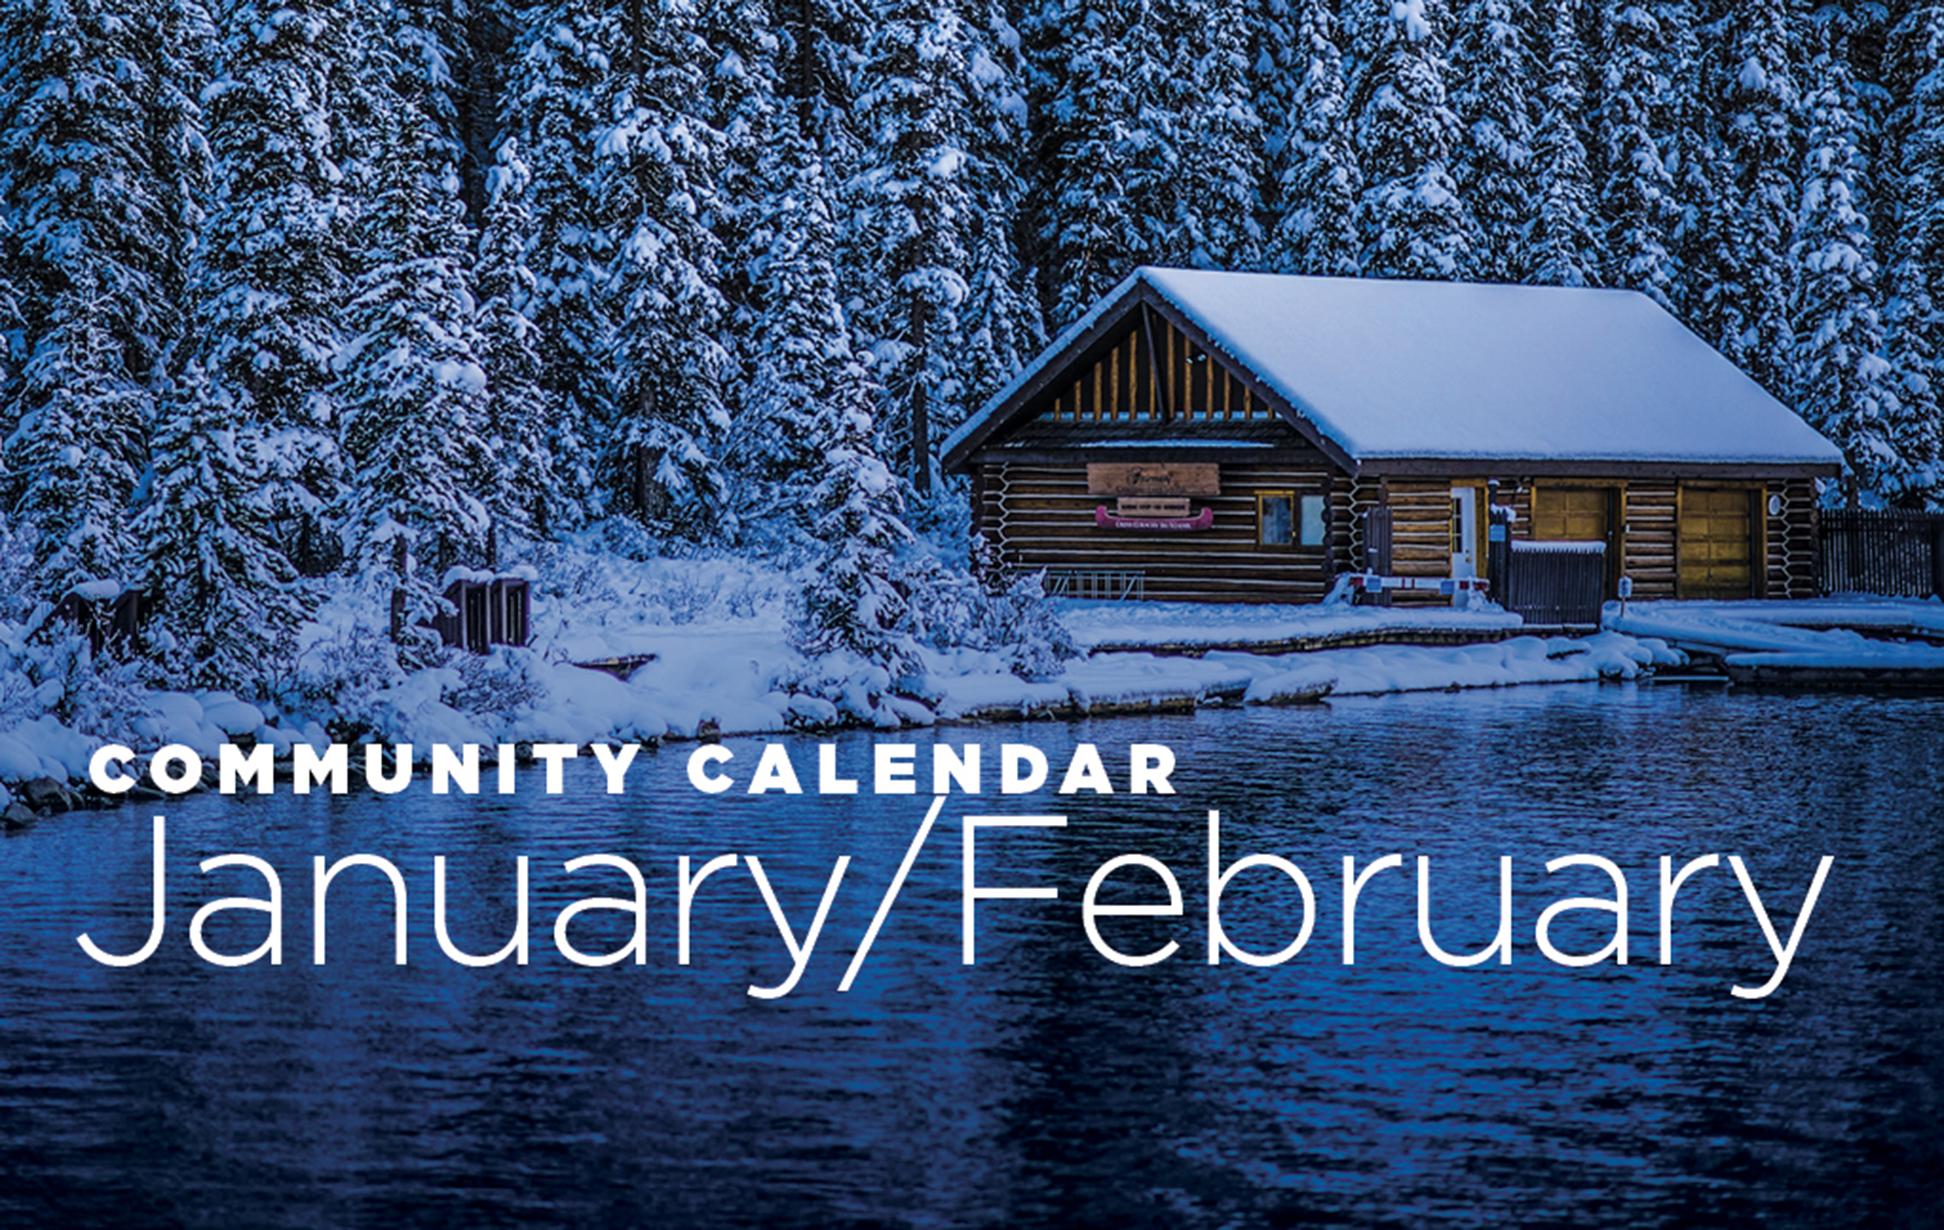 Community Calendar: January and February